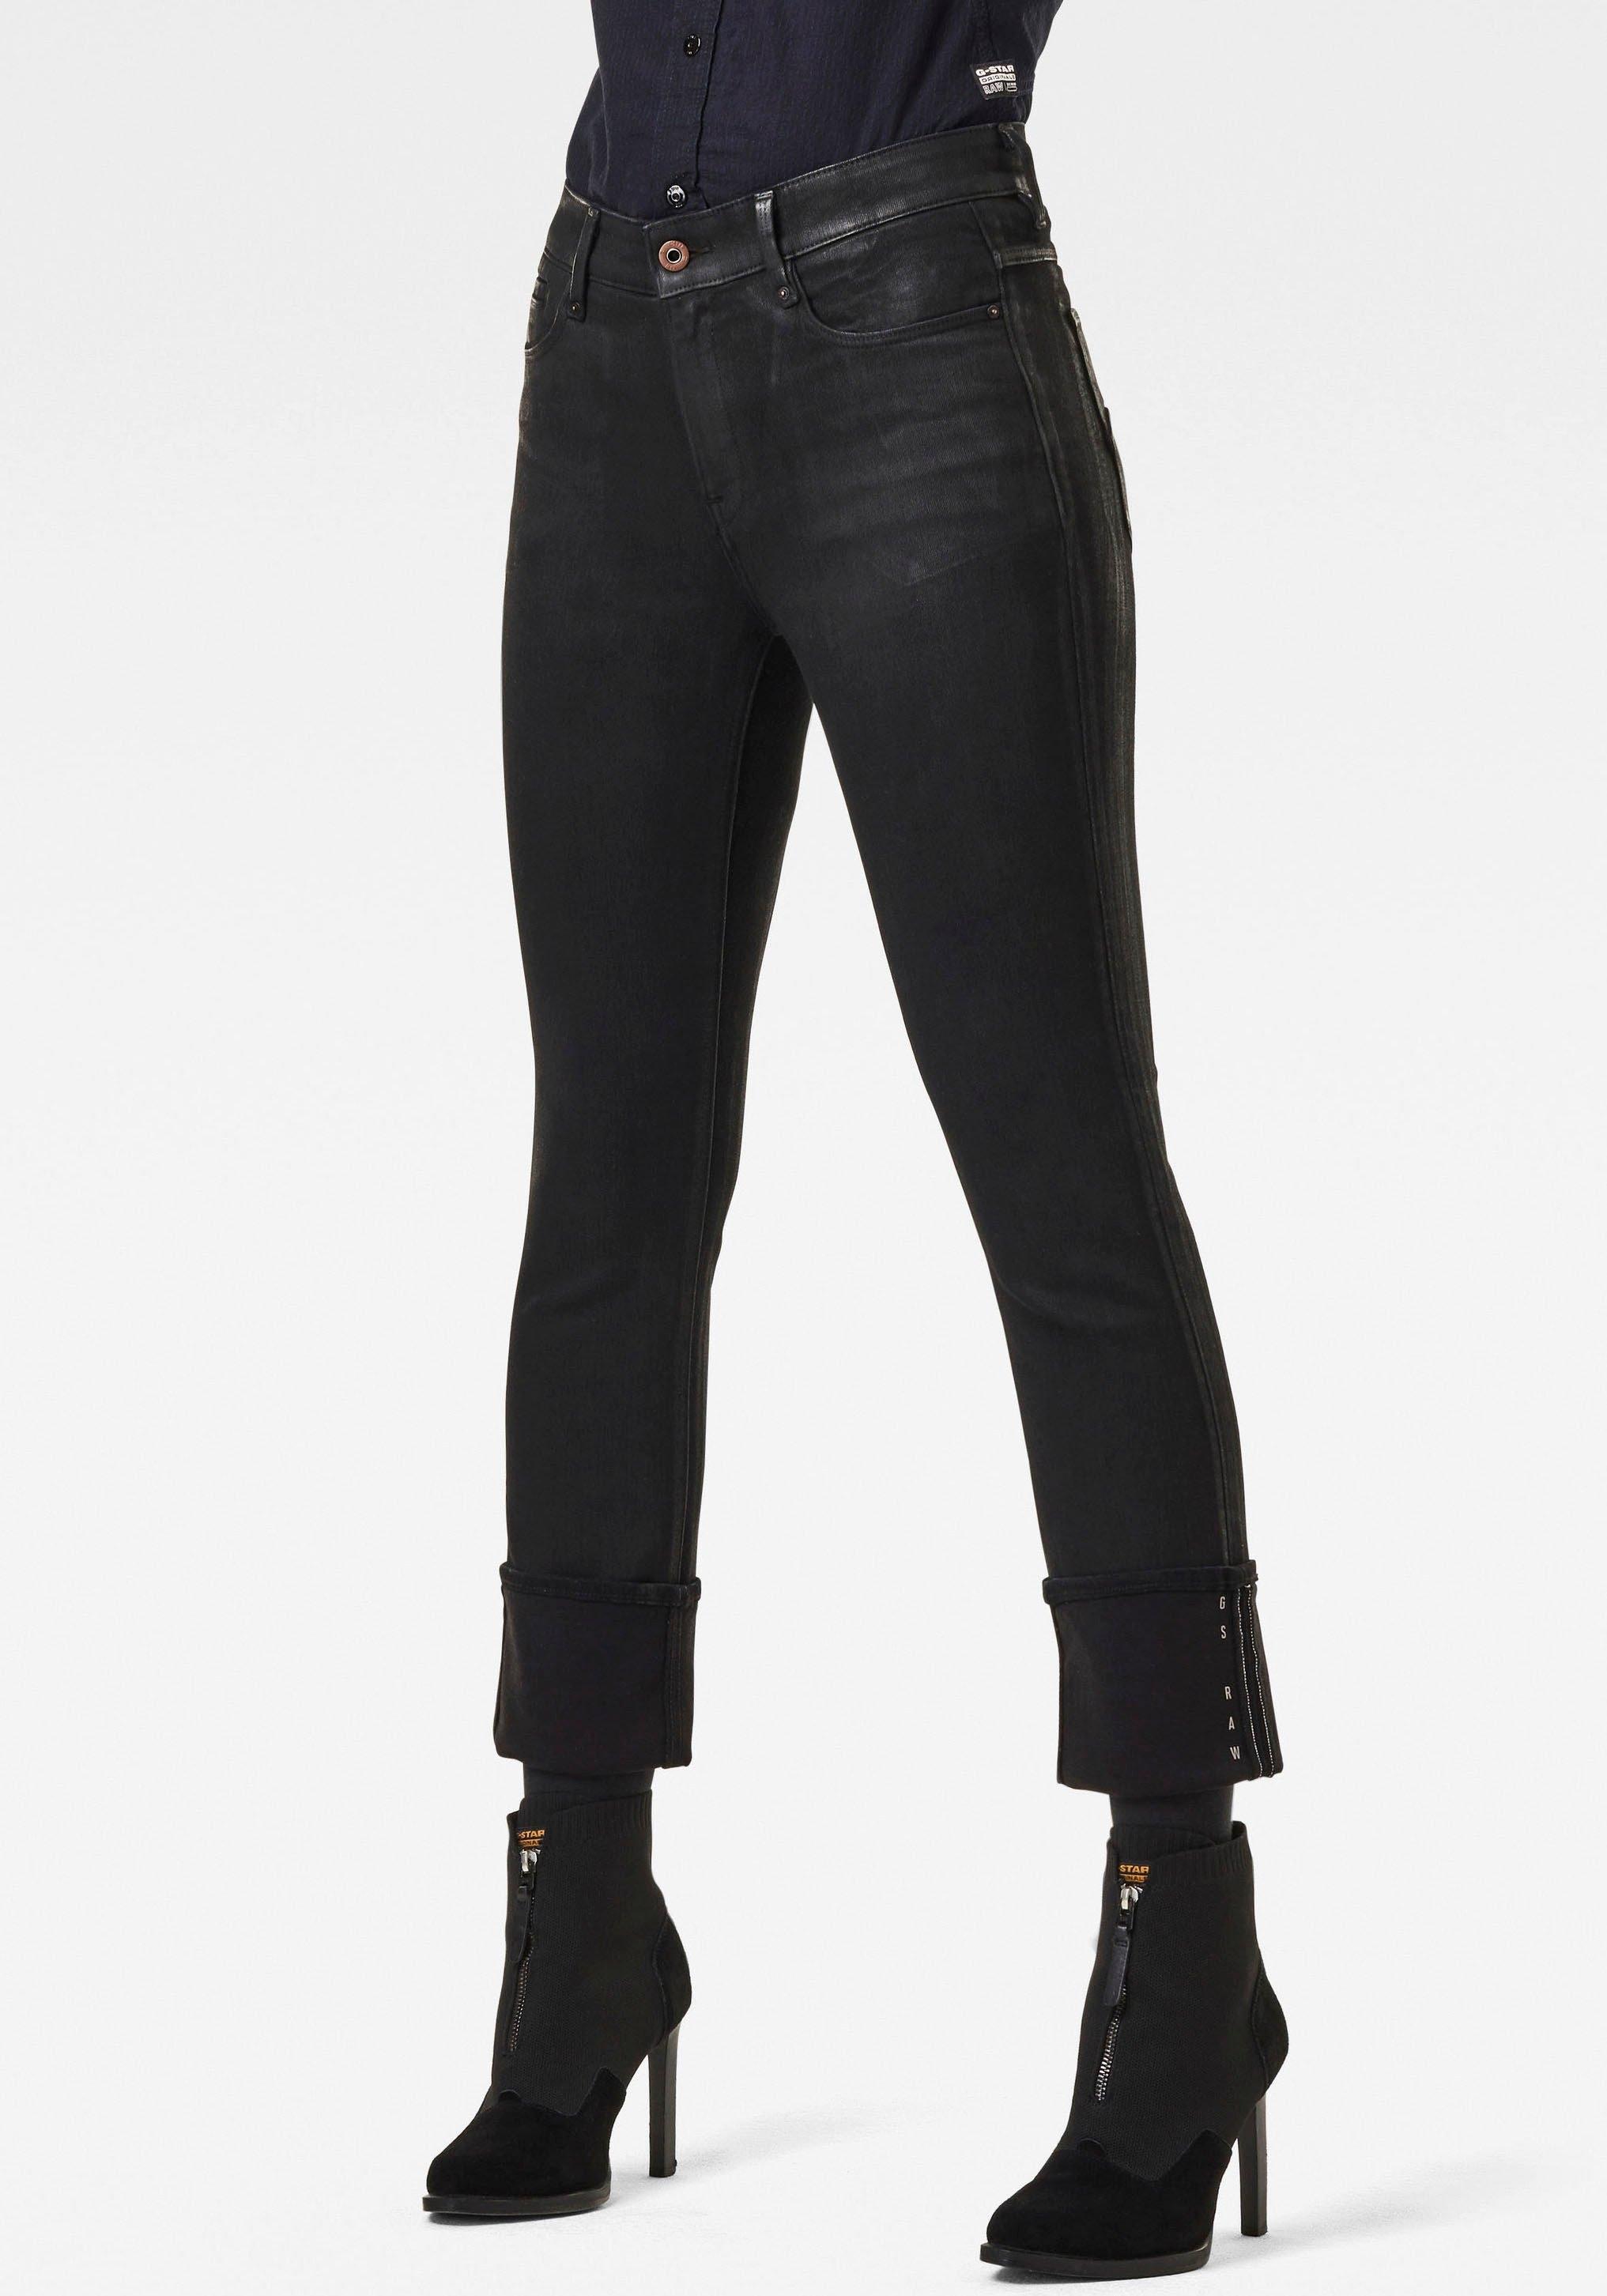 G-Star RAW straight jeans Noxer Navy High Straight Jeans met omslagzoom en logoprint - verschillende betaalmethodes